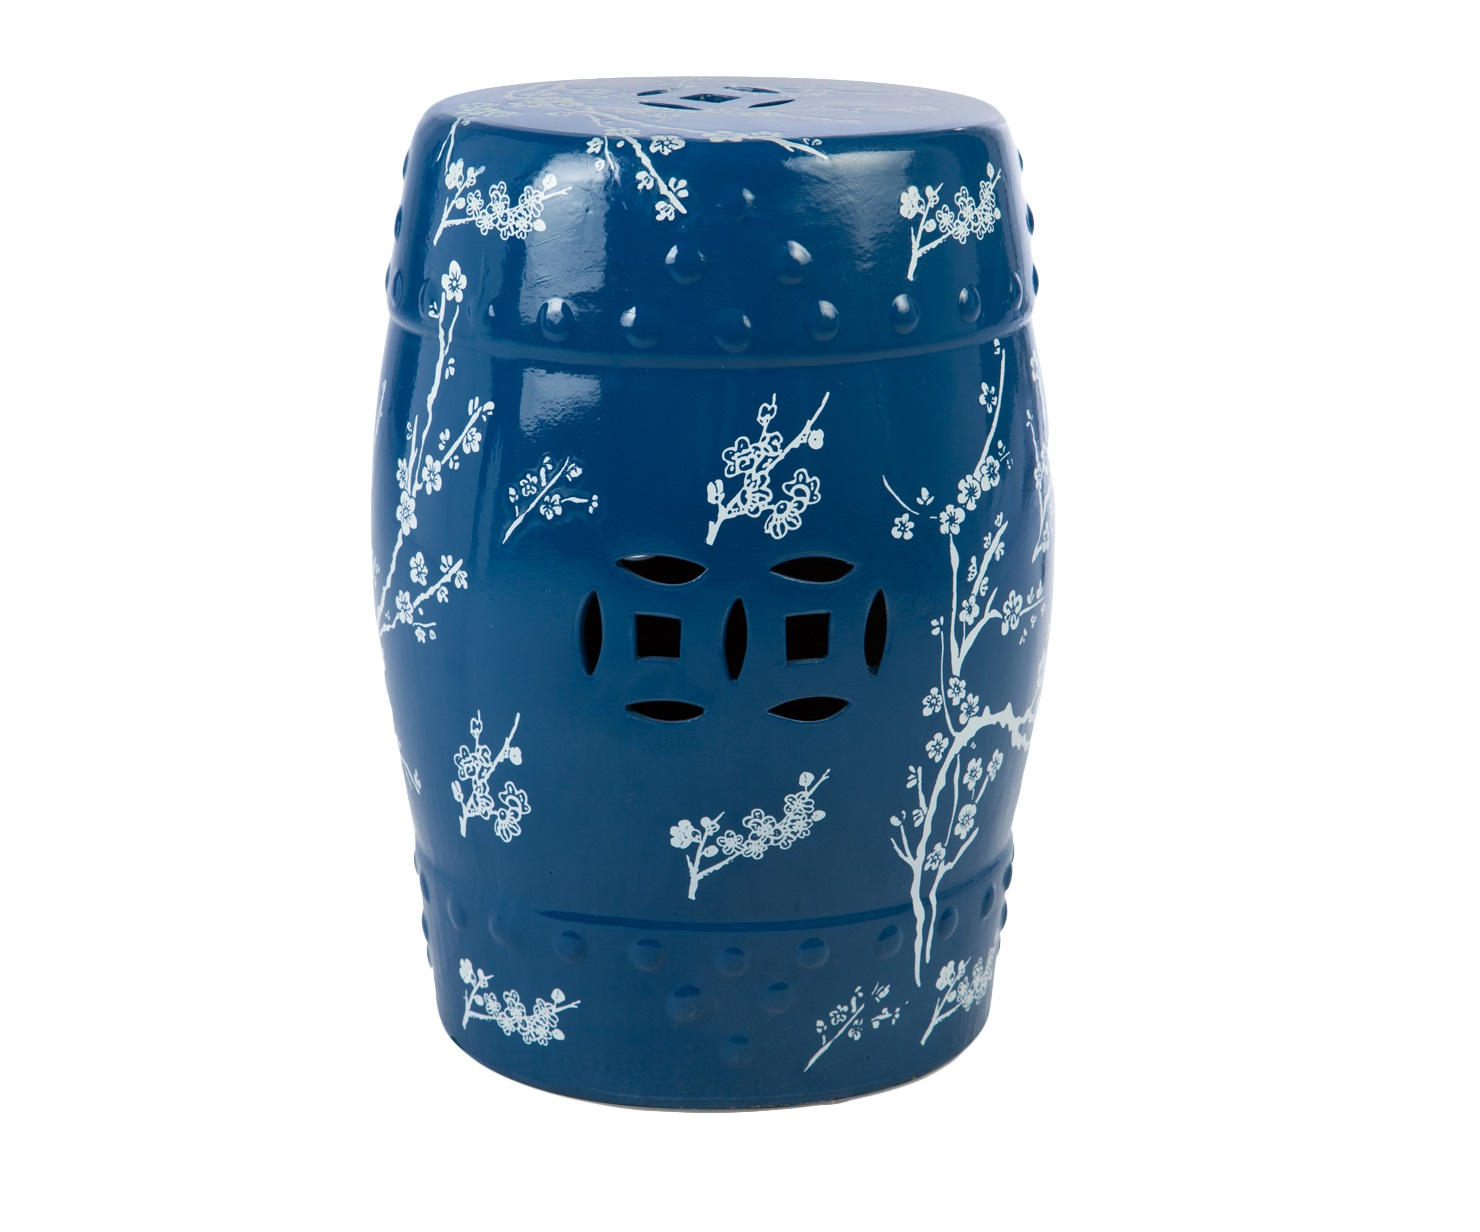 ТабуретТабуреты<br><br><br>Material: Керамика<br>Высота см: 46